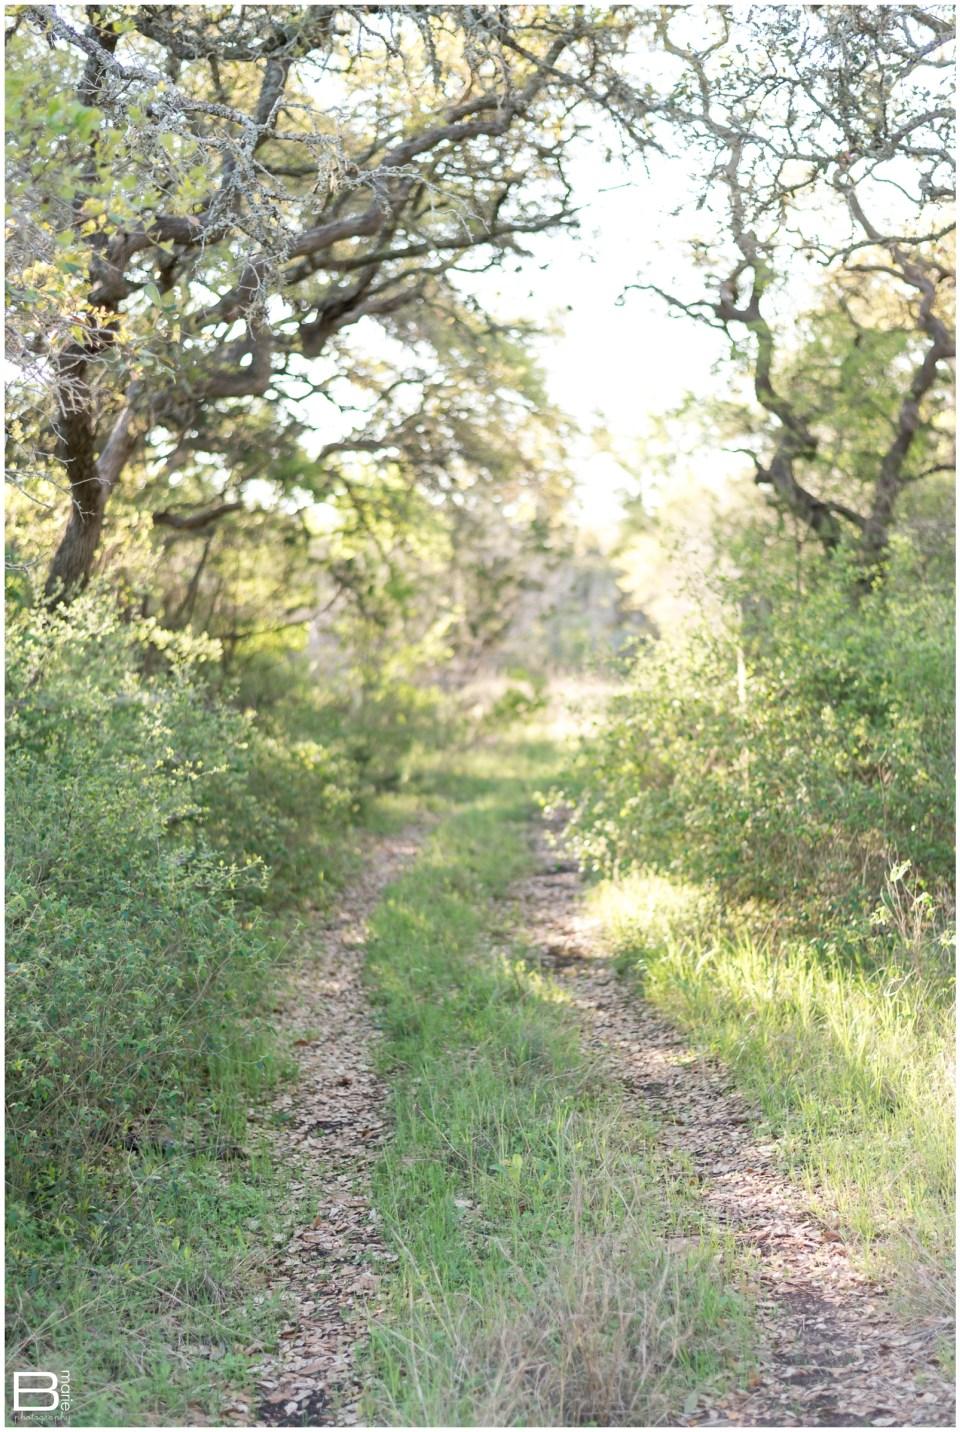 Kingwood Photographer image of wooded path